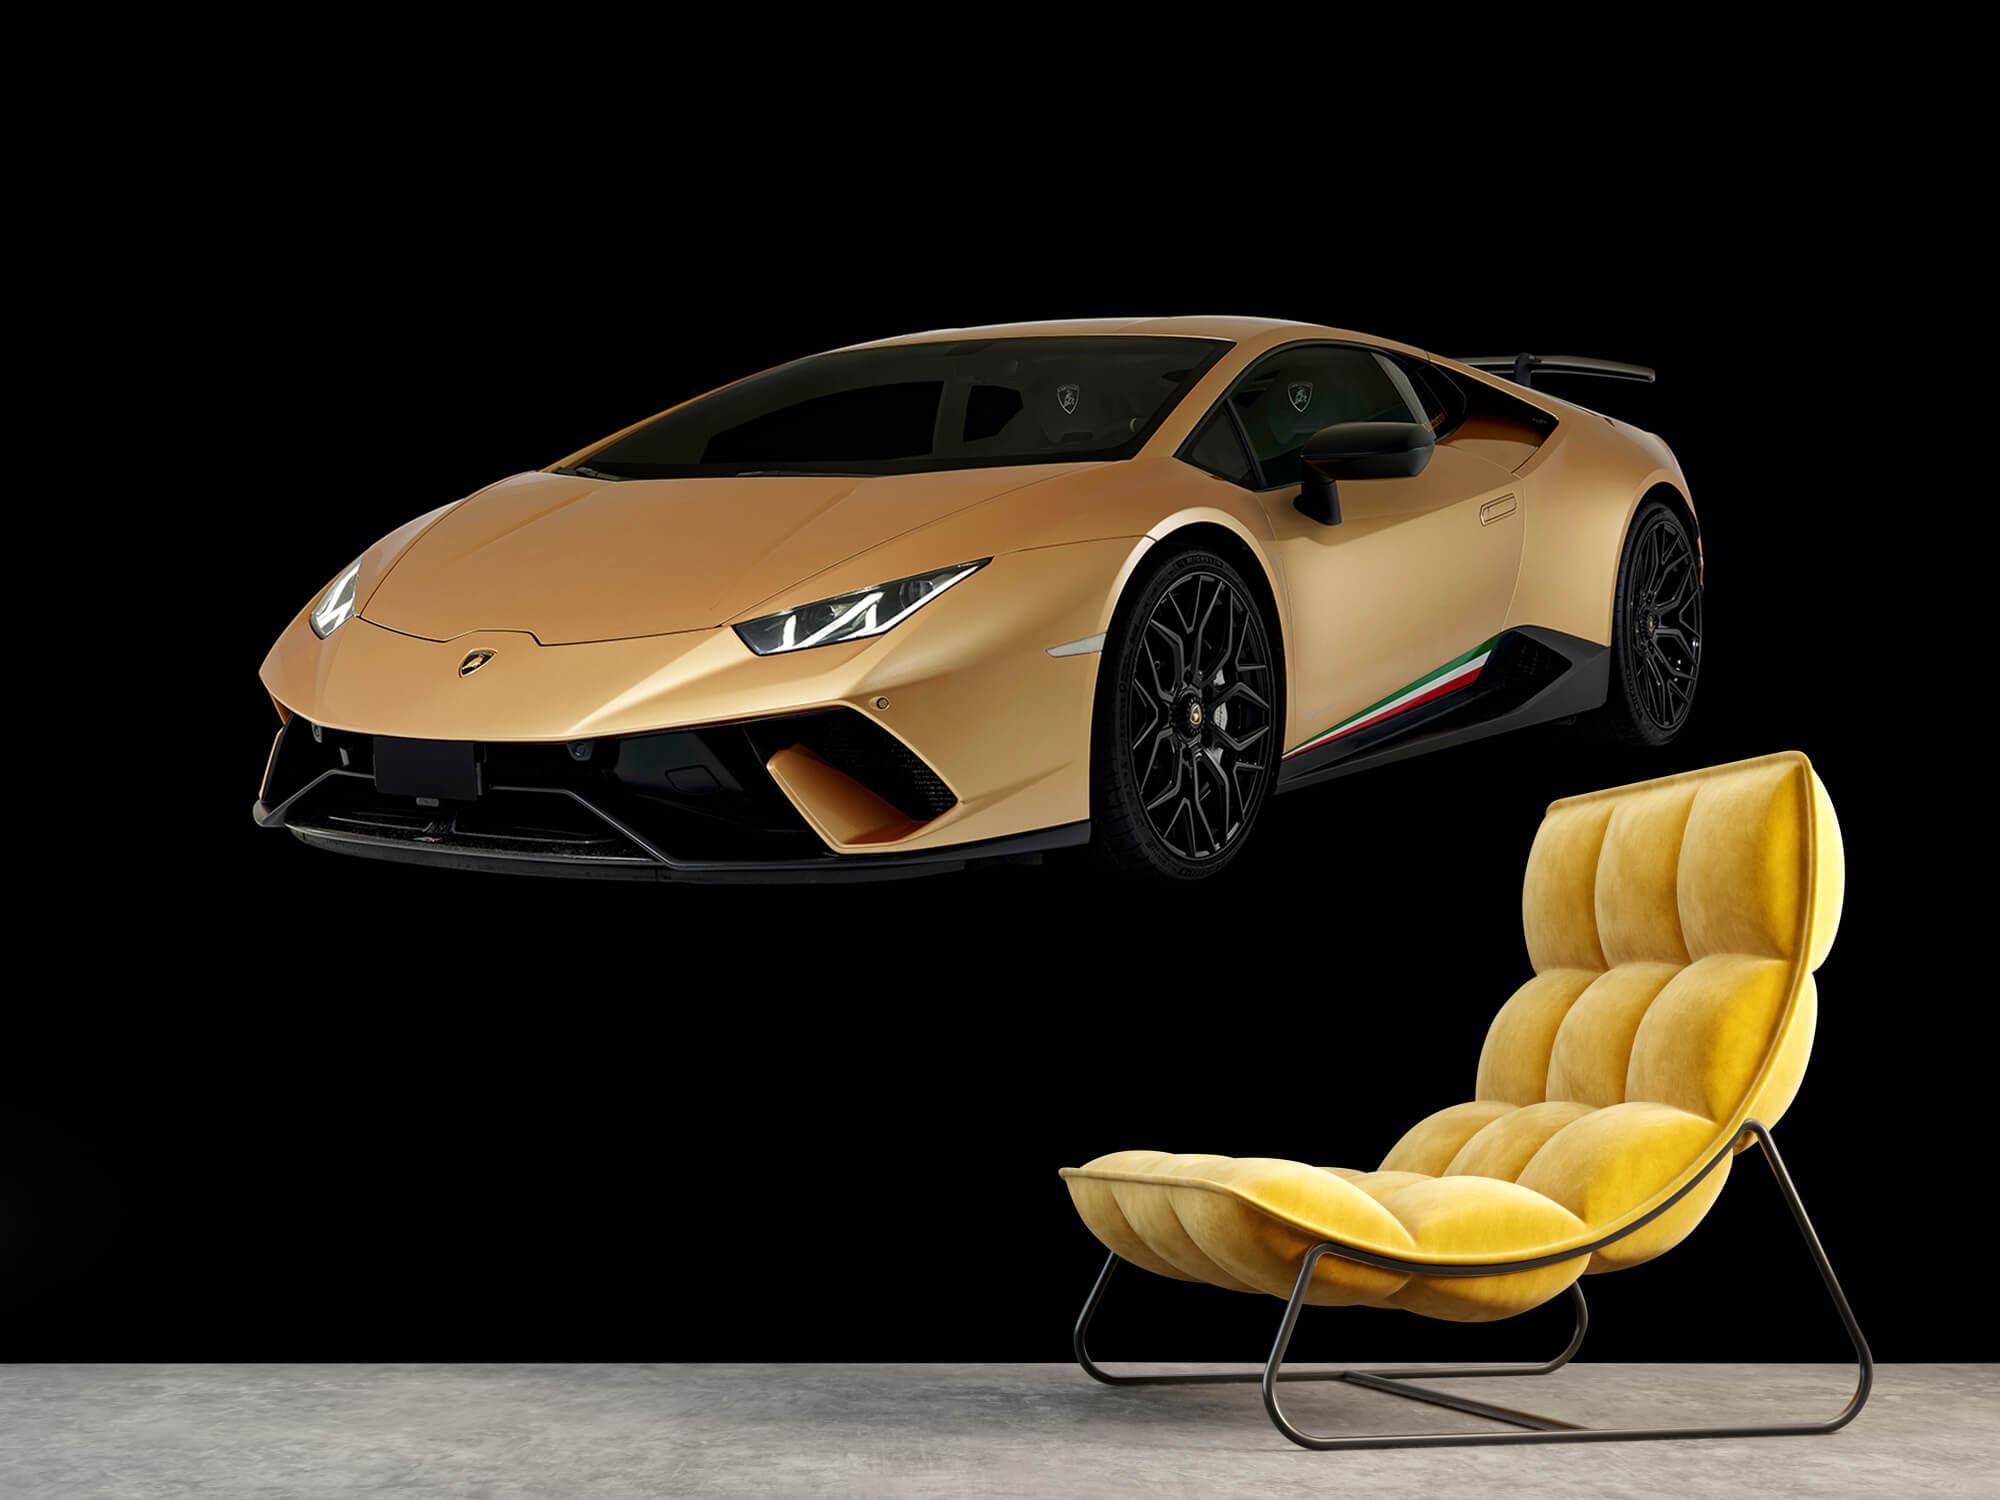 Wallpaper Lamborghini Huracán - Rechter voorkant, zwart 3